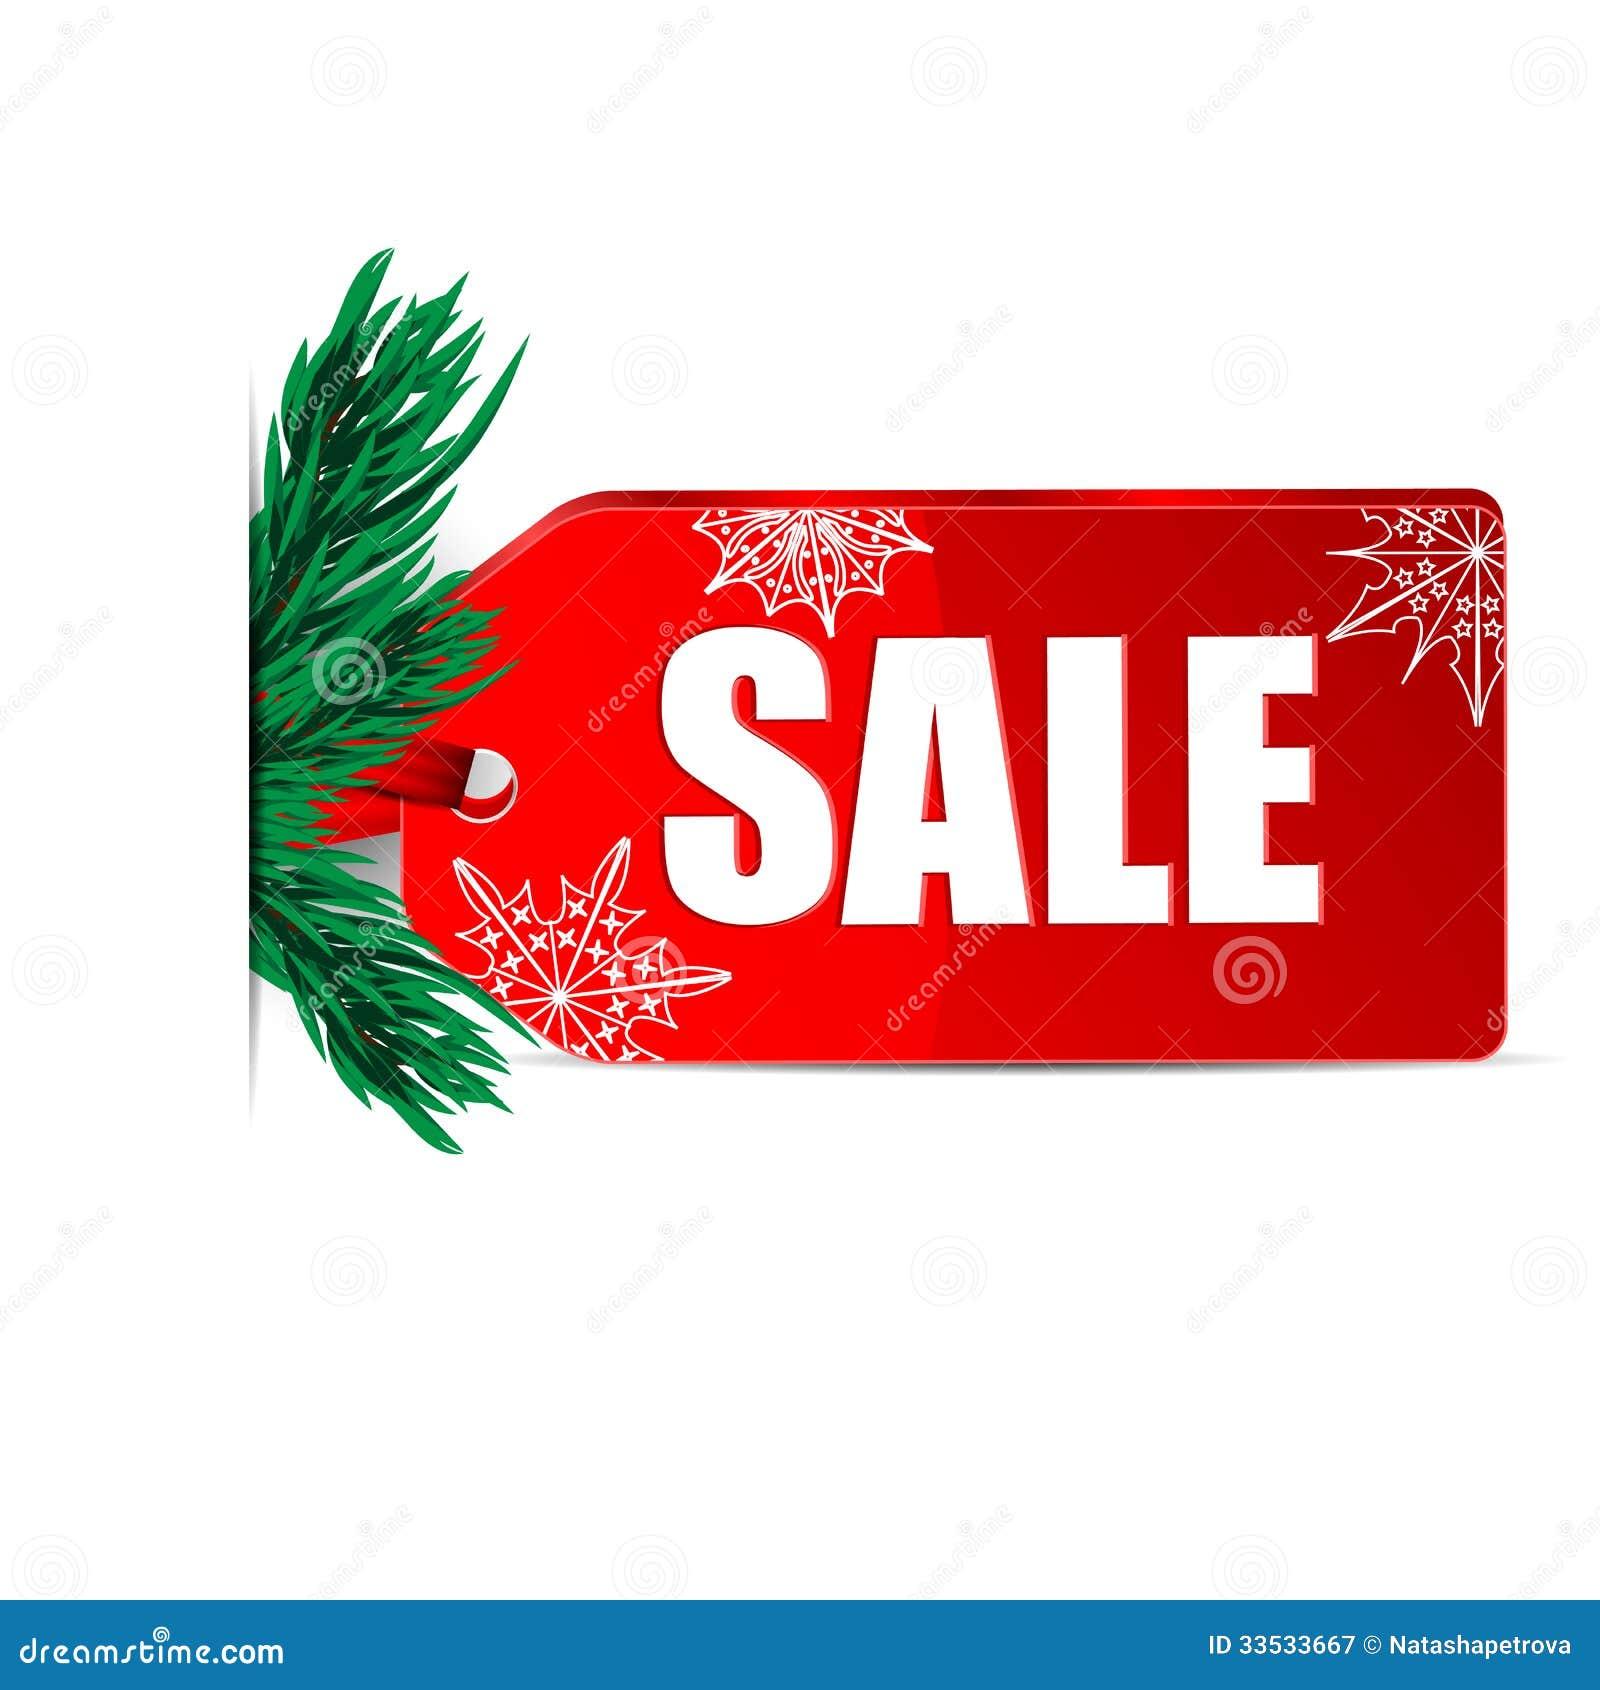 Viagra for women sale